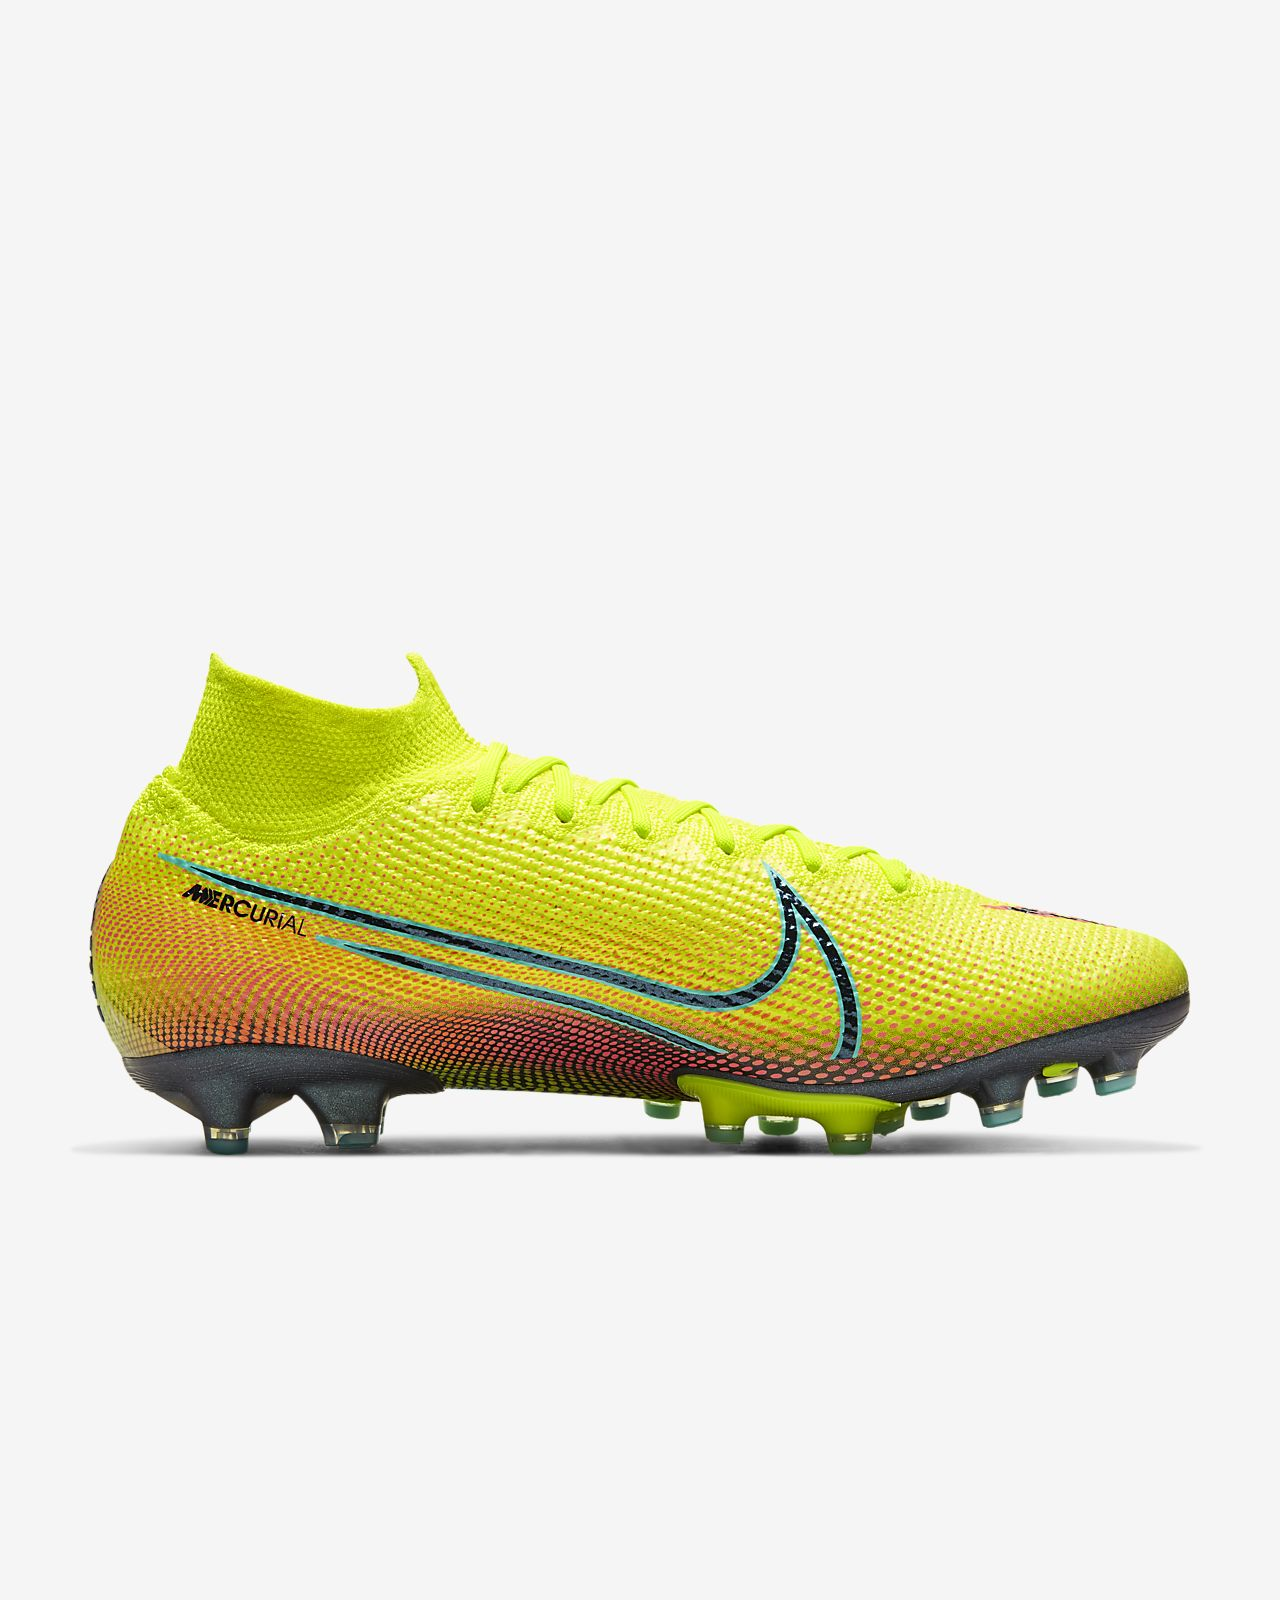 Chaussure de football à crampons pour terrain synthétique Nike Mercurial Superfly 7 Elite MDS AG PRO